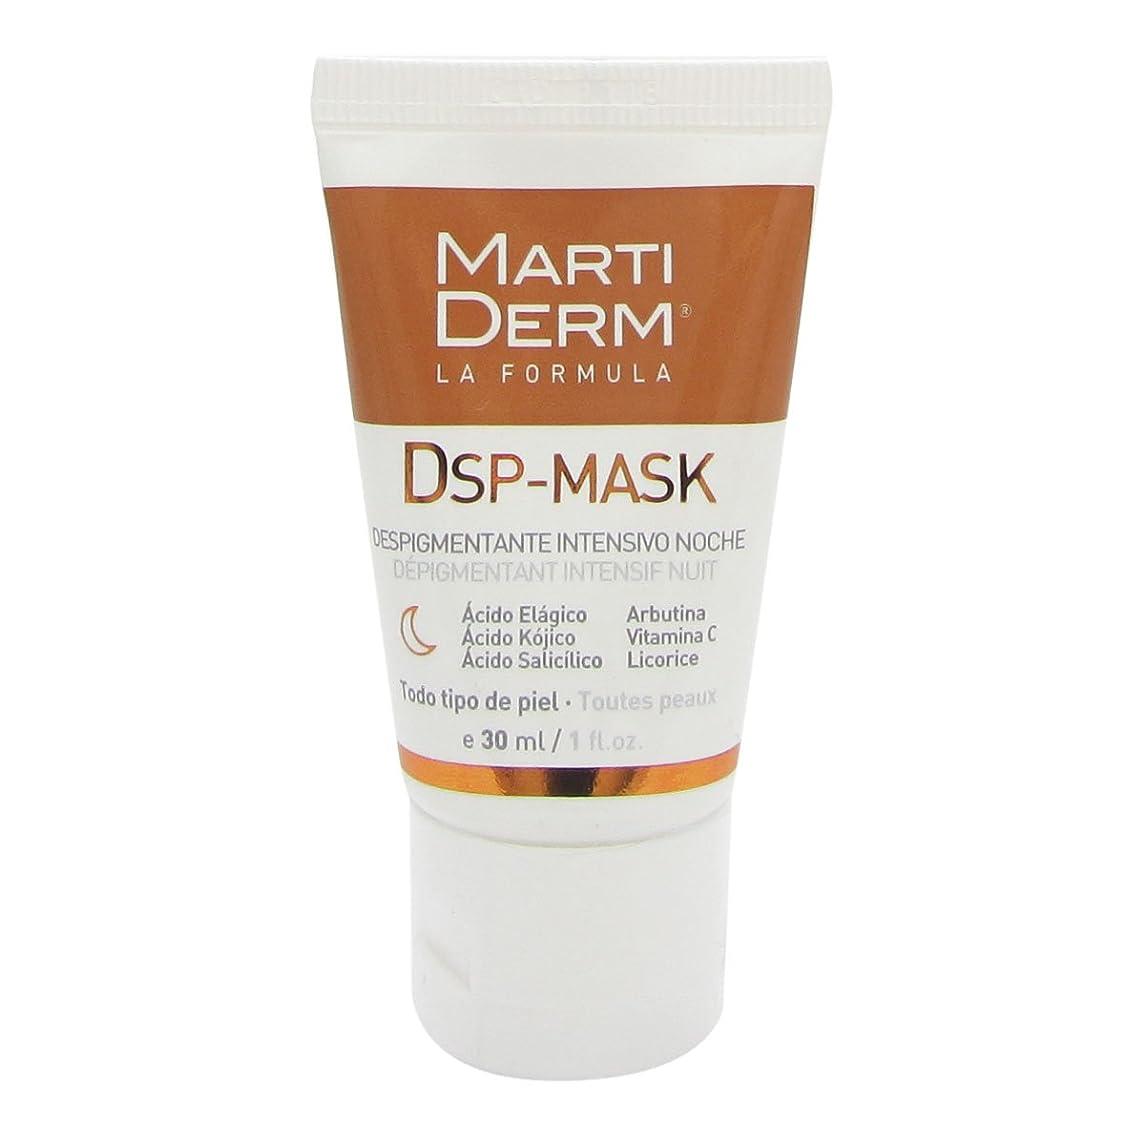 反抗繁雑校長Martiderm Dsp-mask Intensive Depigmenting Night 30ml [並行輸入品]